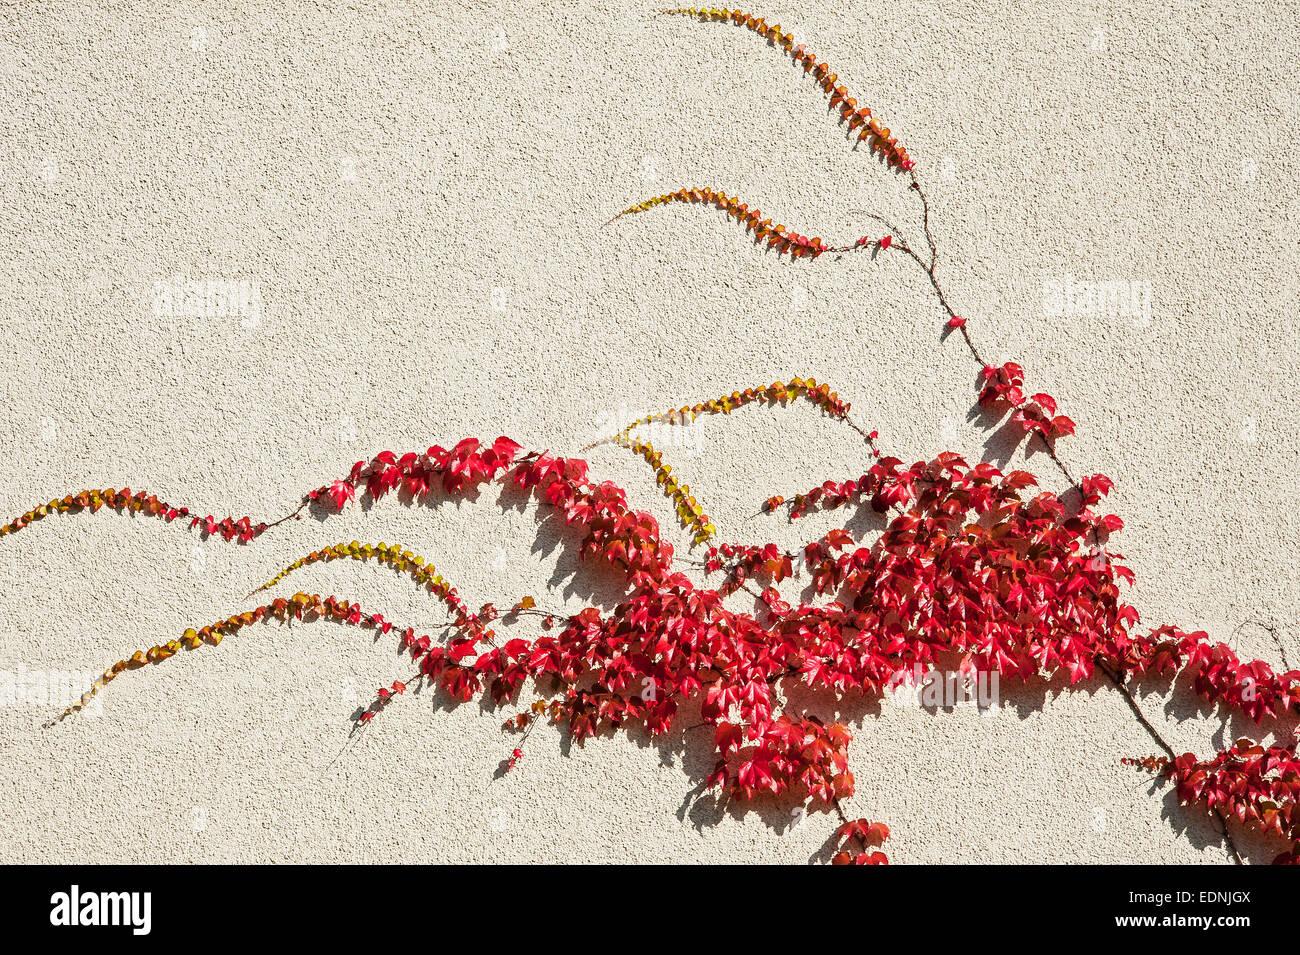 Japanese Creeper, Boston Ivy or Woodbine (Parthenocissus tricuspidata), Bavaria, Germany - Stock Image